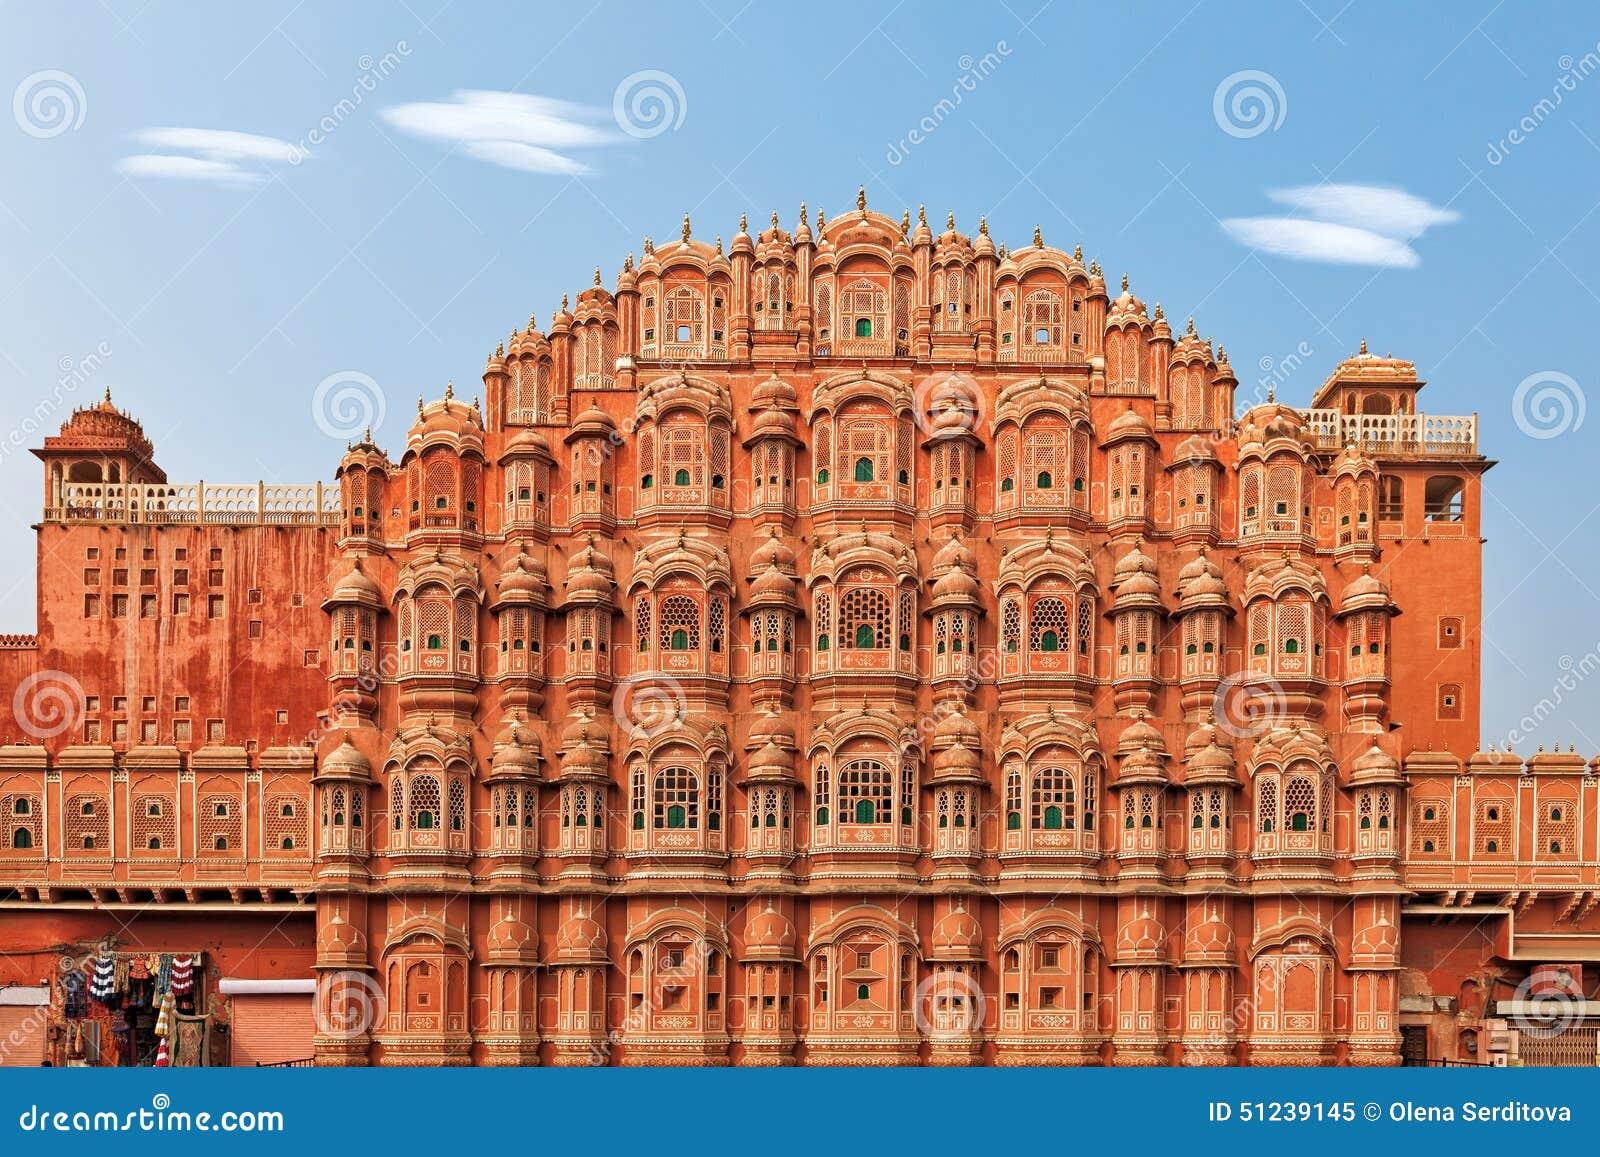 hawa mahal palast der winde in indien stockbild bild von harem palast 51239145. Black Bedroom Furniture Sets. Home Design Ideas